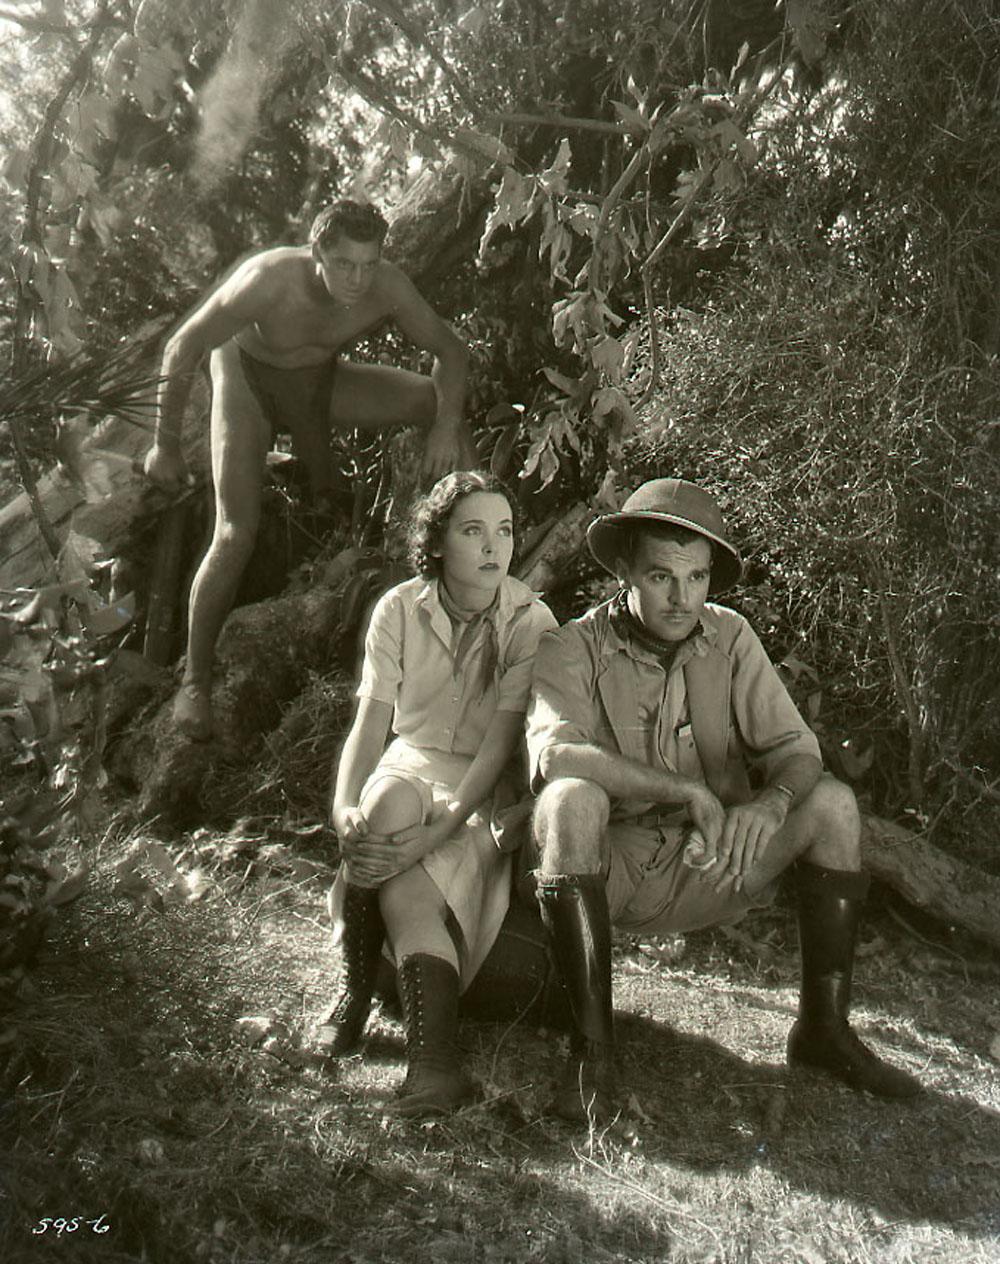 Johnny Weismuller, Maureen O'Sullivan, Neil Hamilton in Tarzan the Ape Man